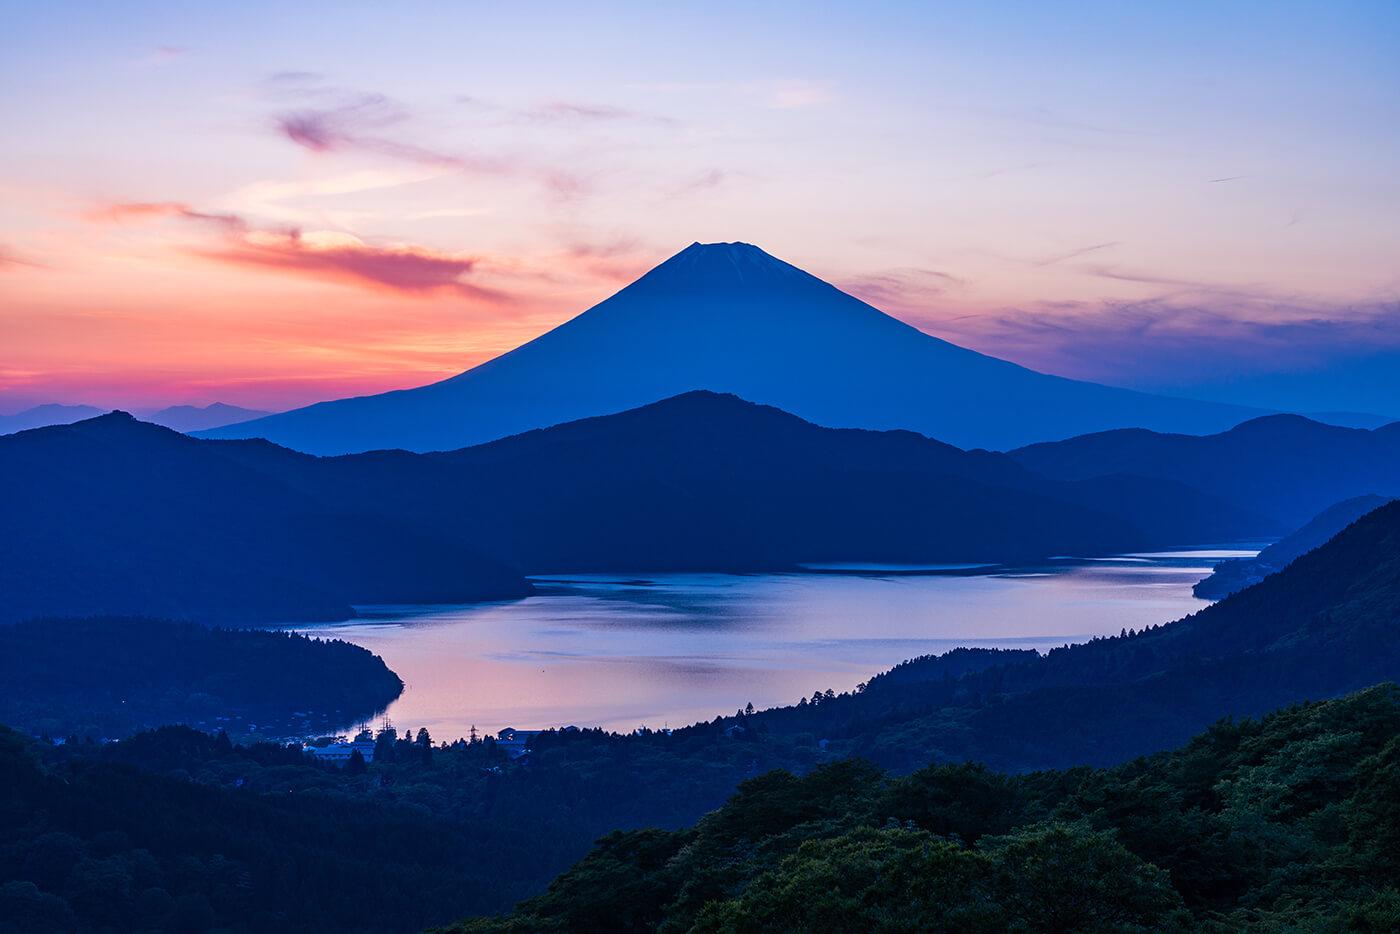 Mont Fuji 富士山